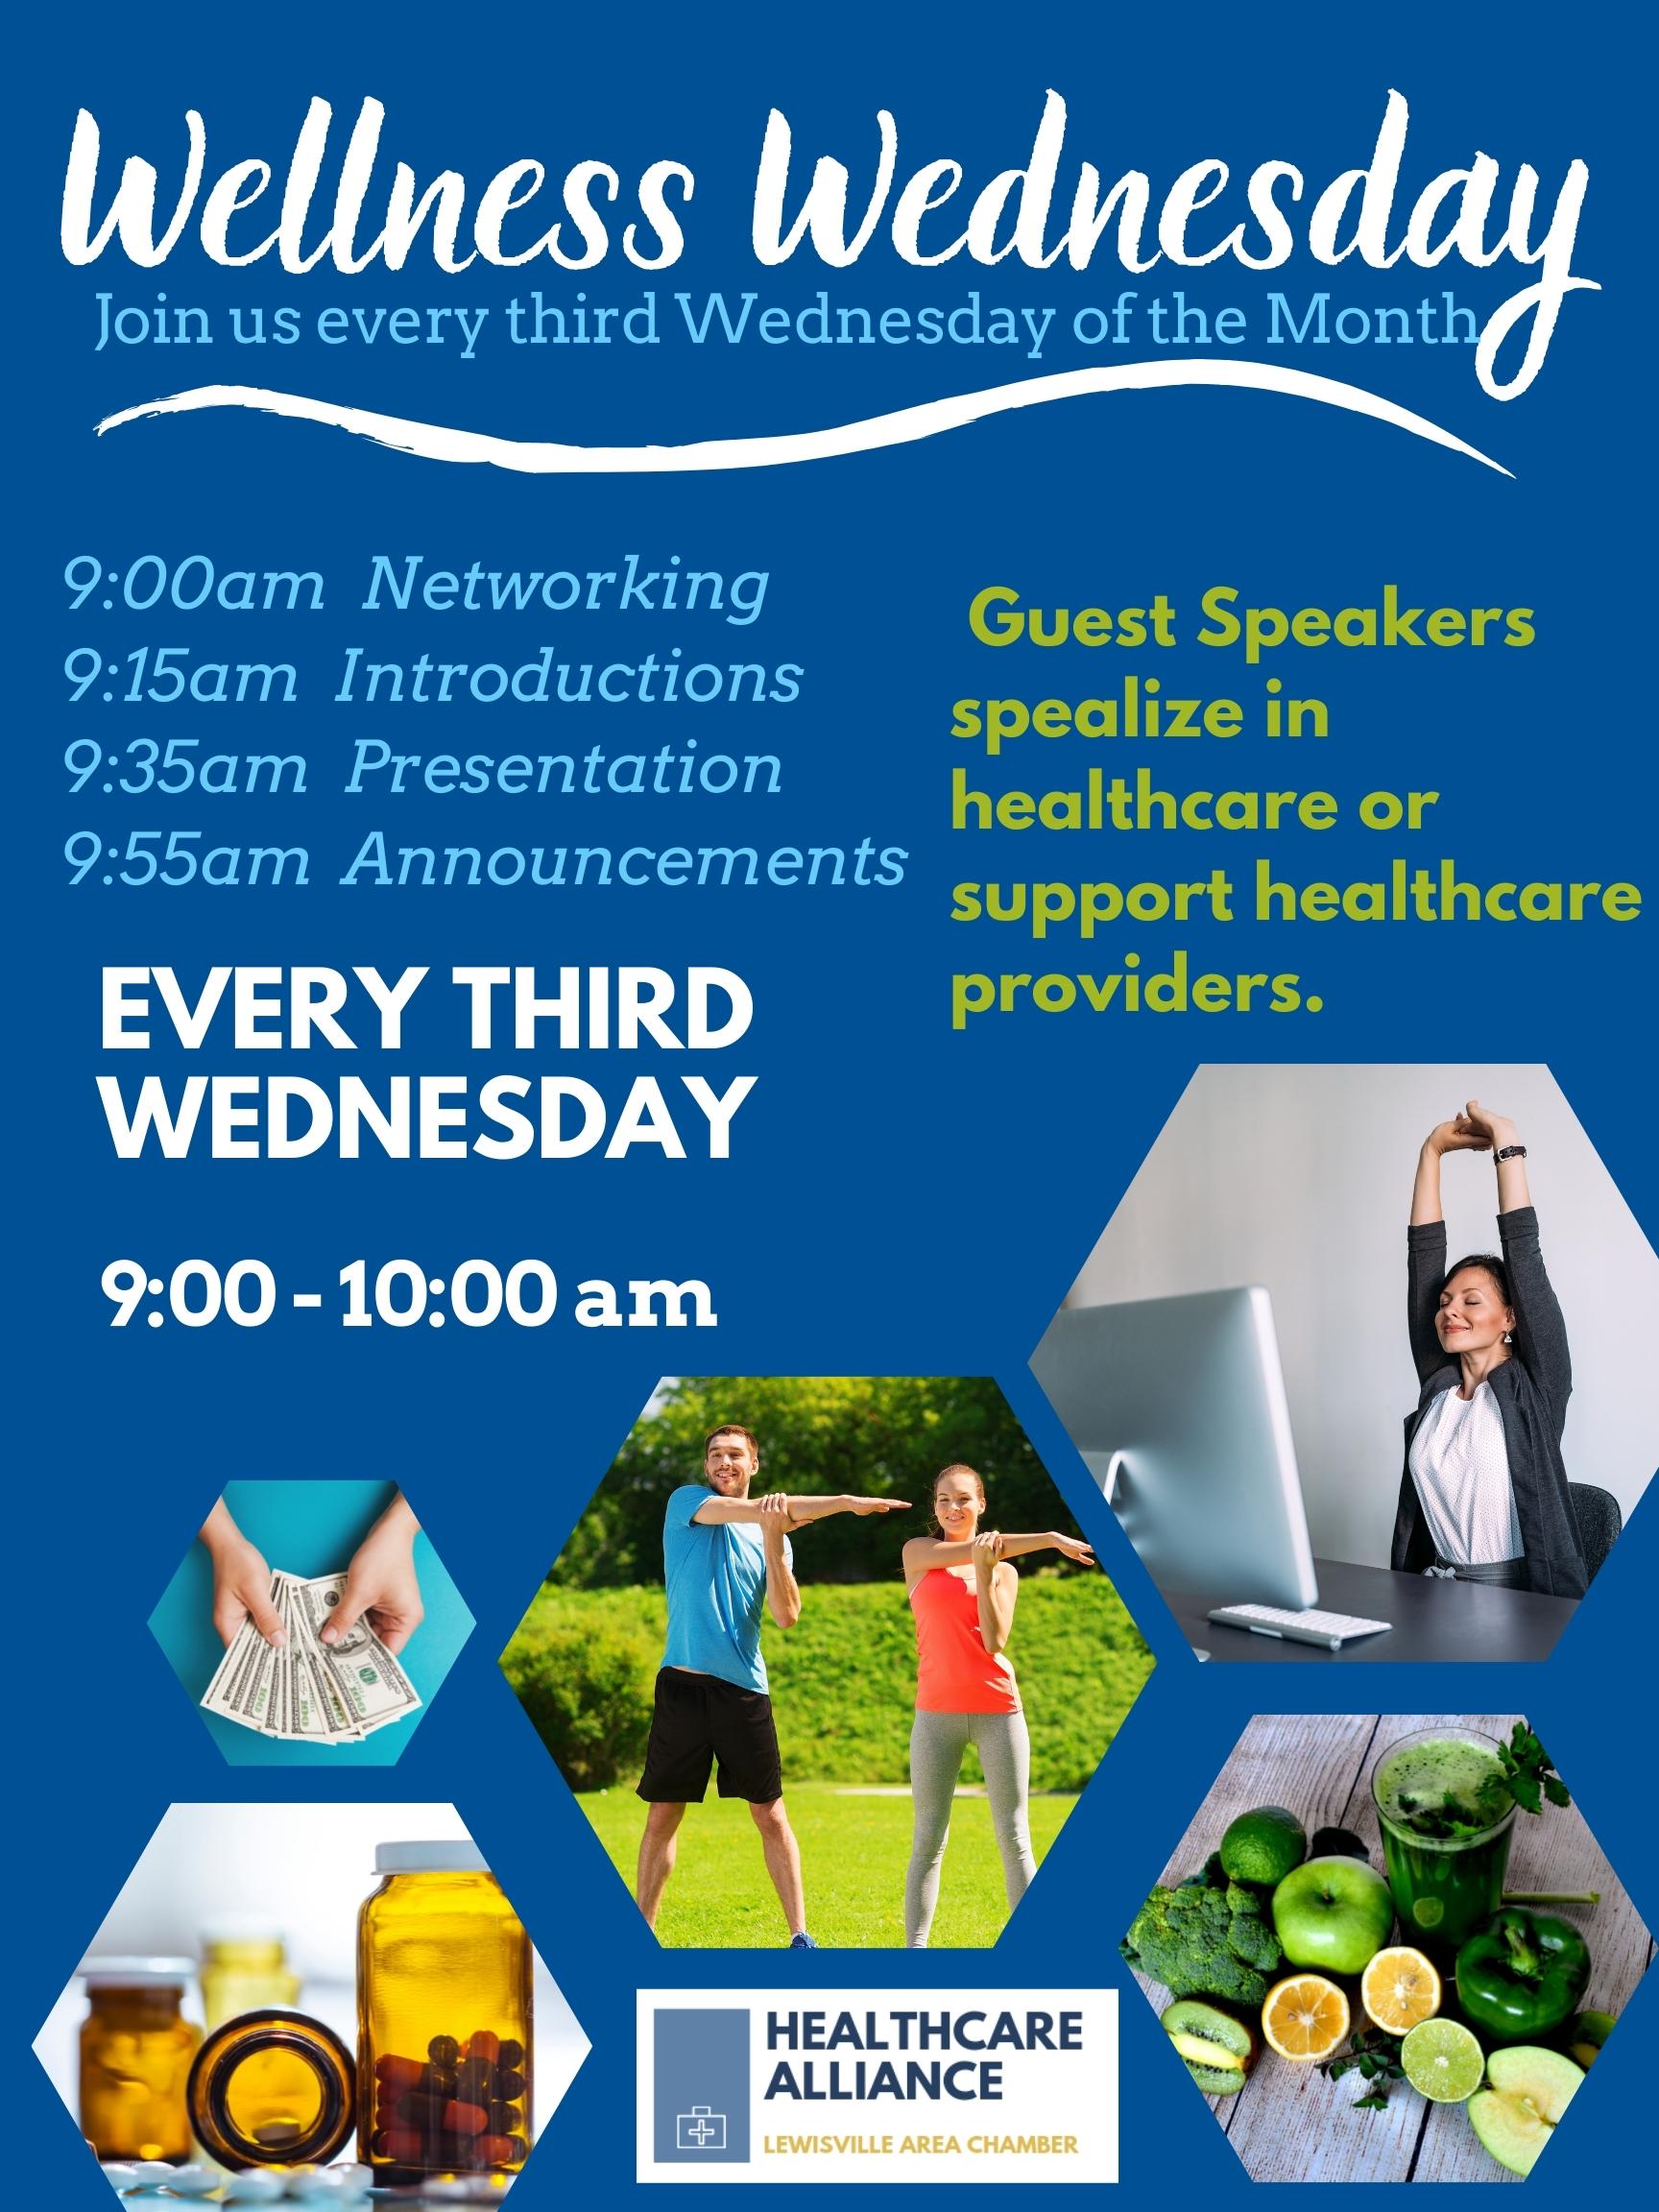 Wellness-Wednesday-General-Info-(1).jpg